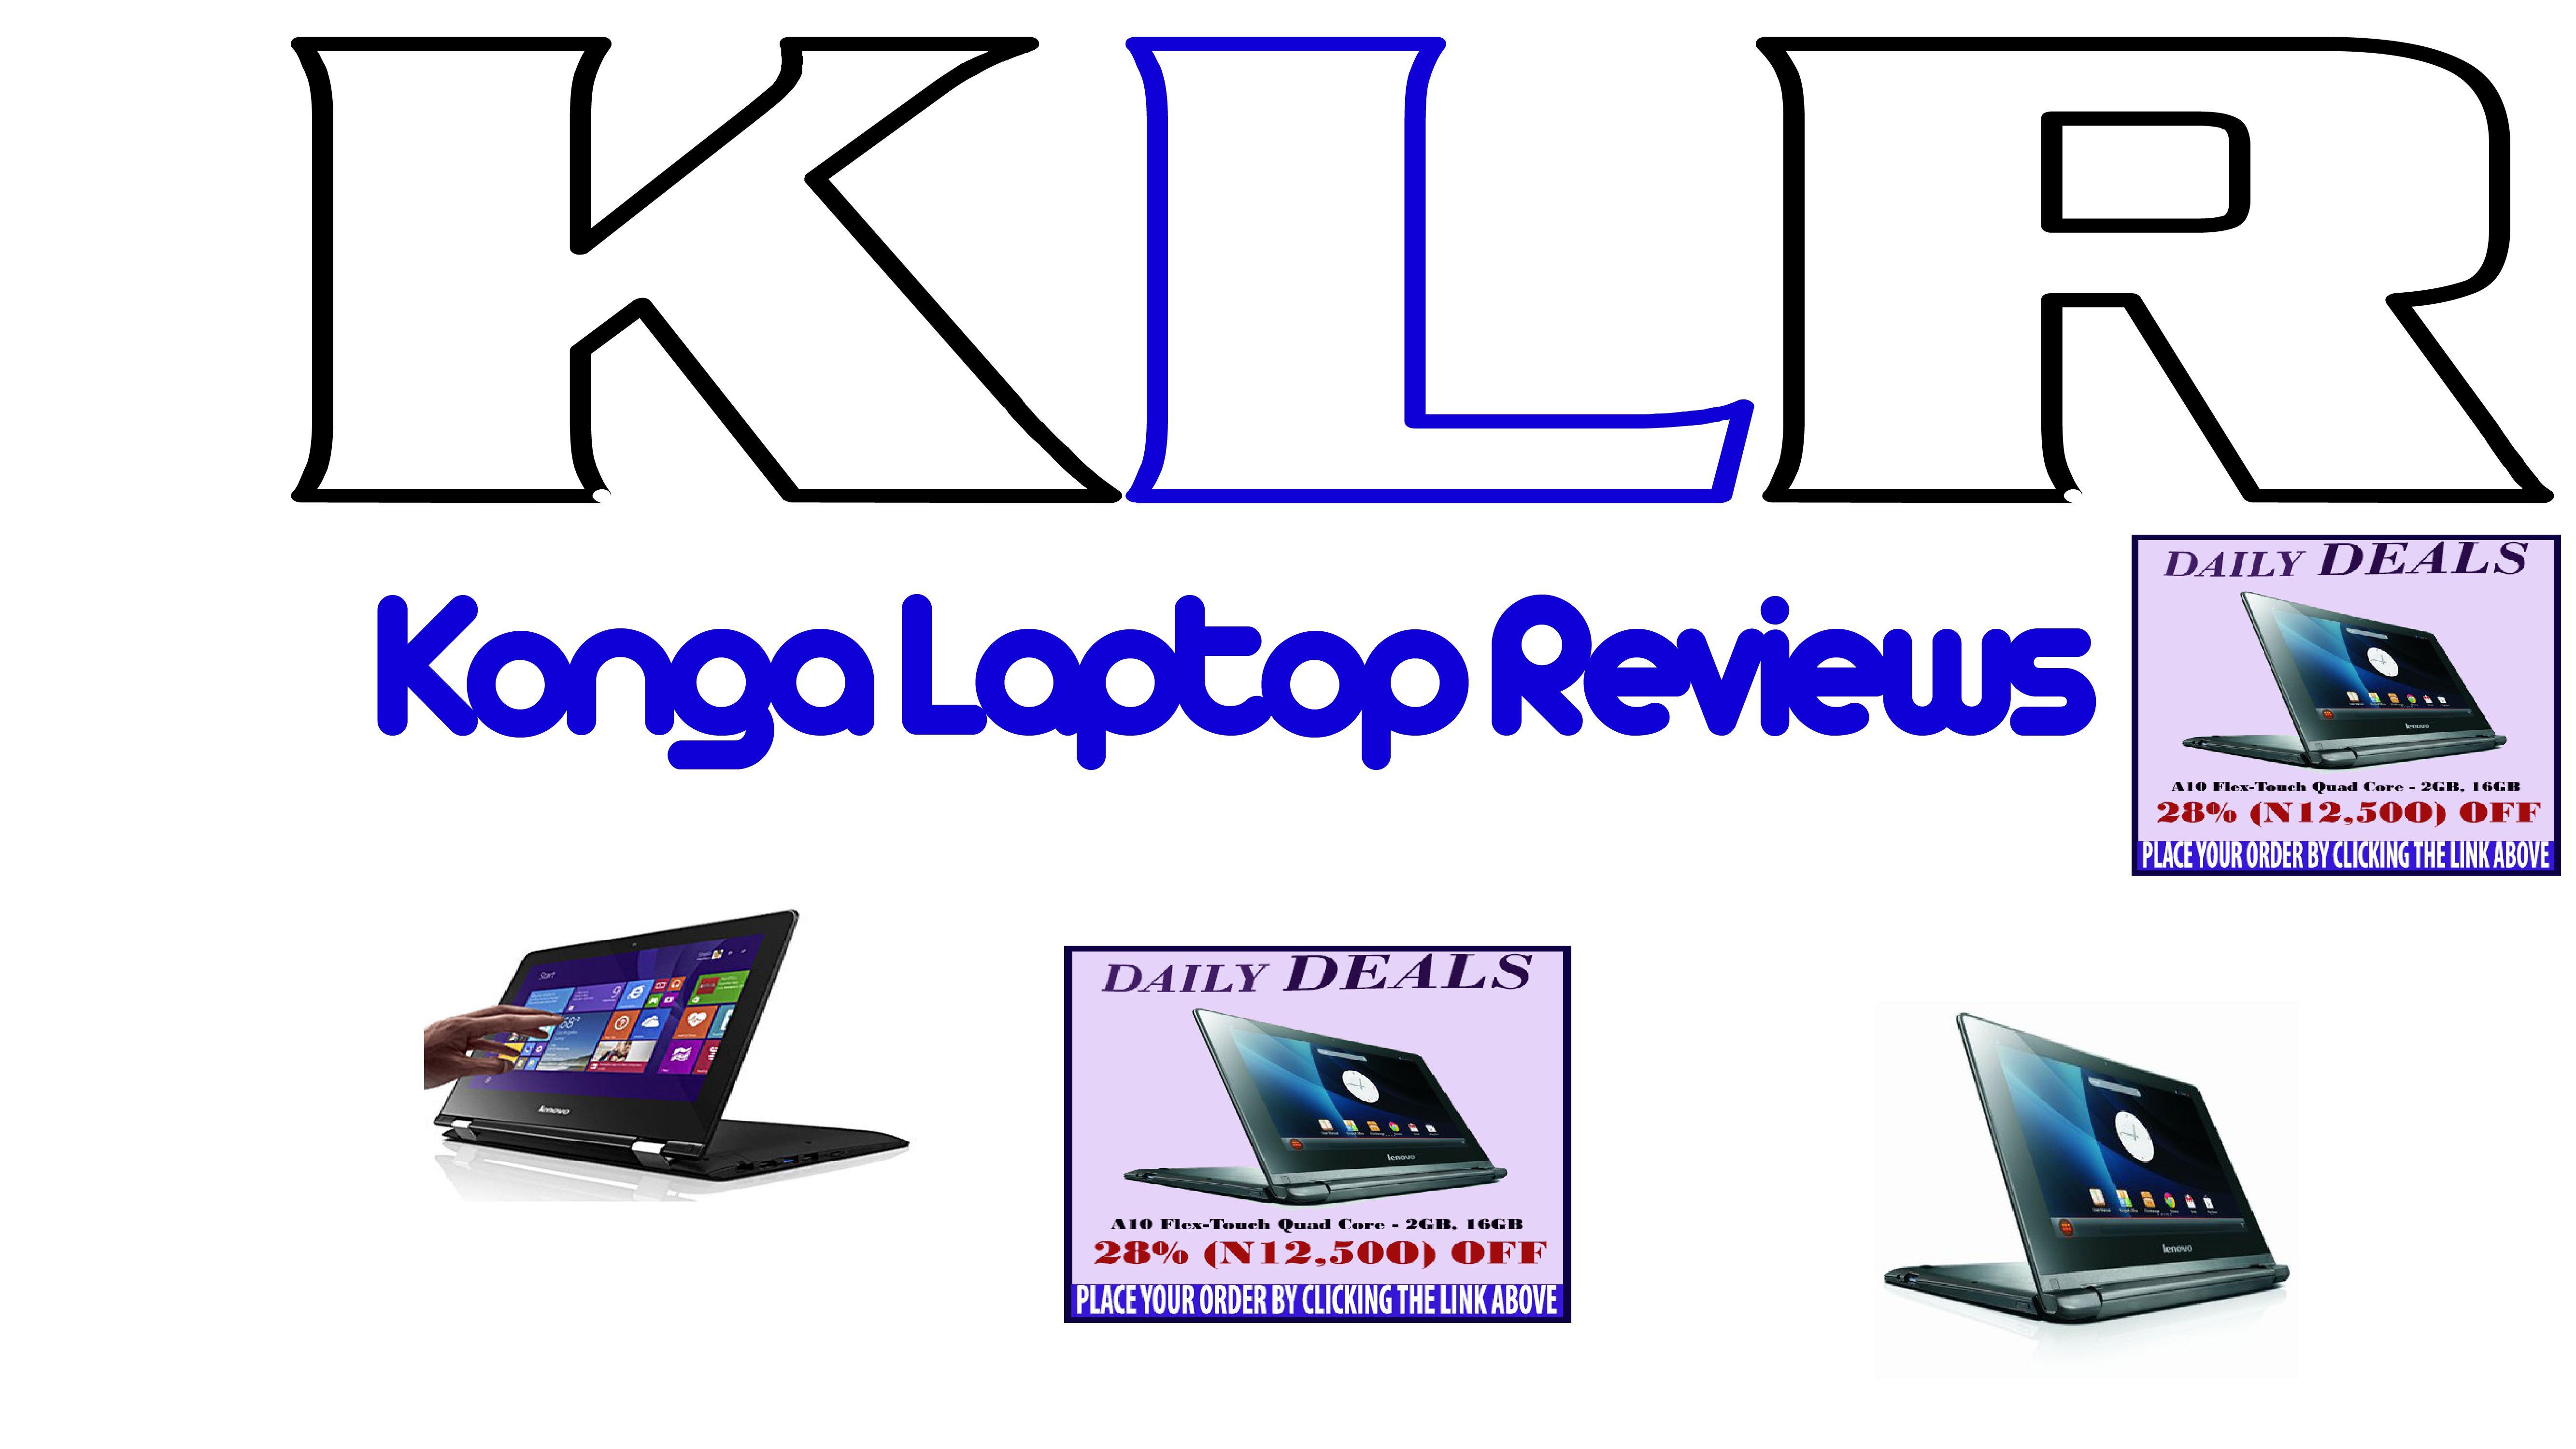 KONGA LAPTOP REVIEWS is dedicated to helping online